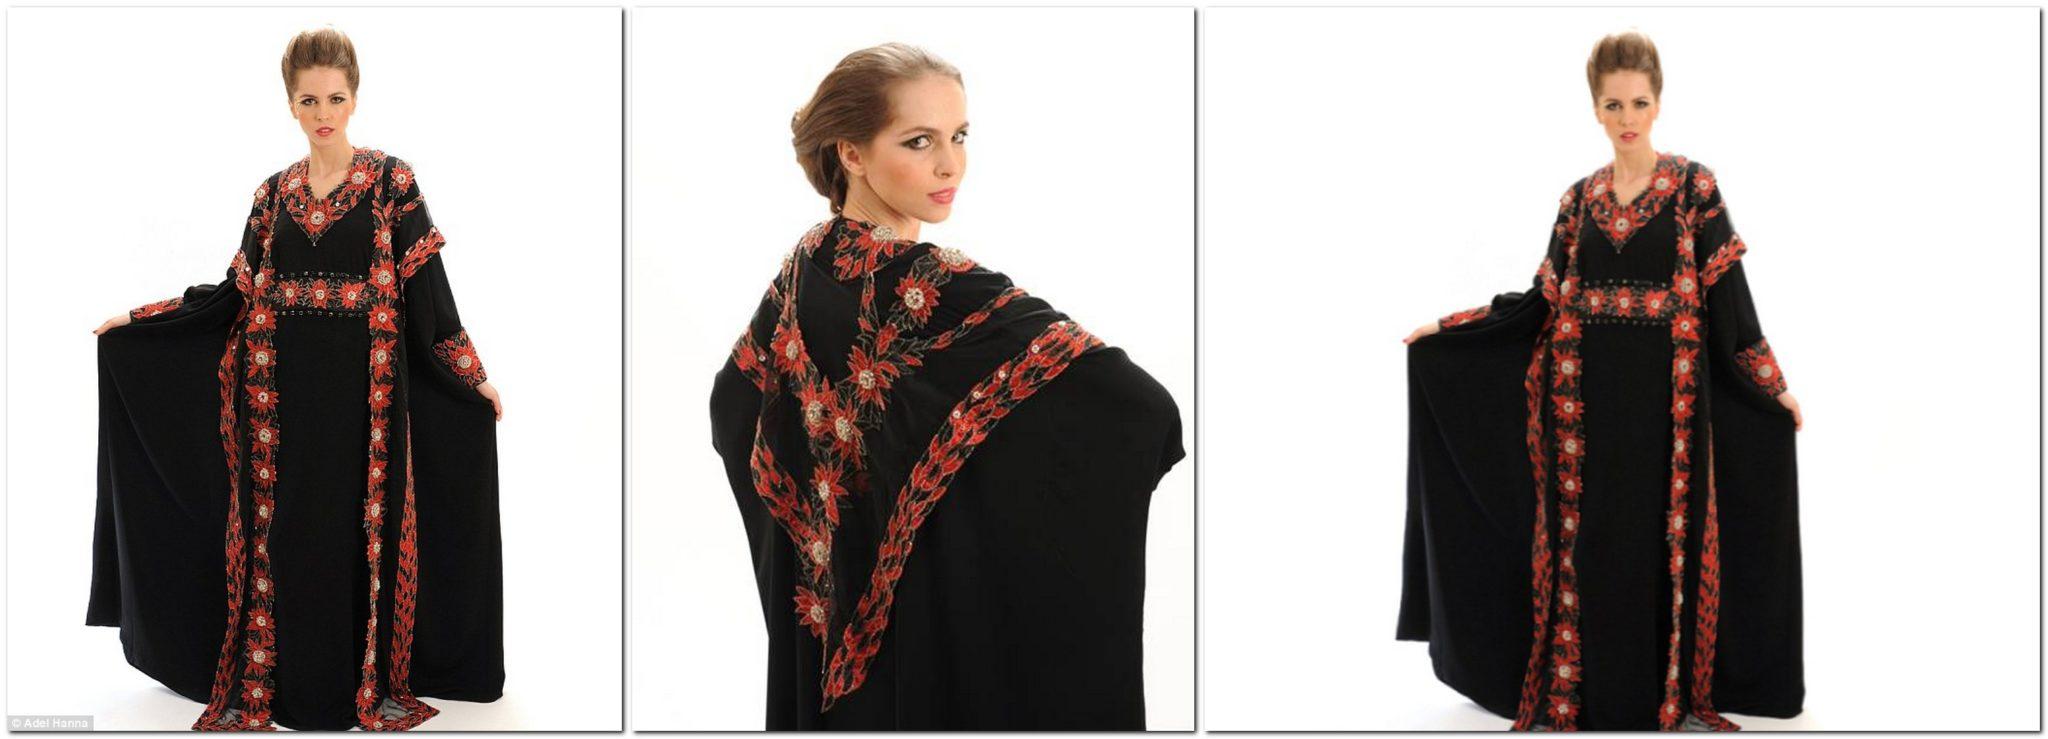 Abaya, designed by Debbie Wingham.